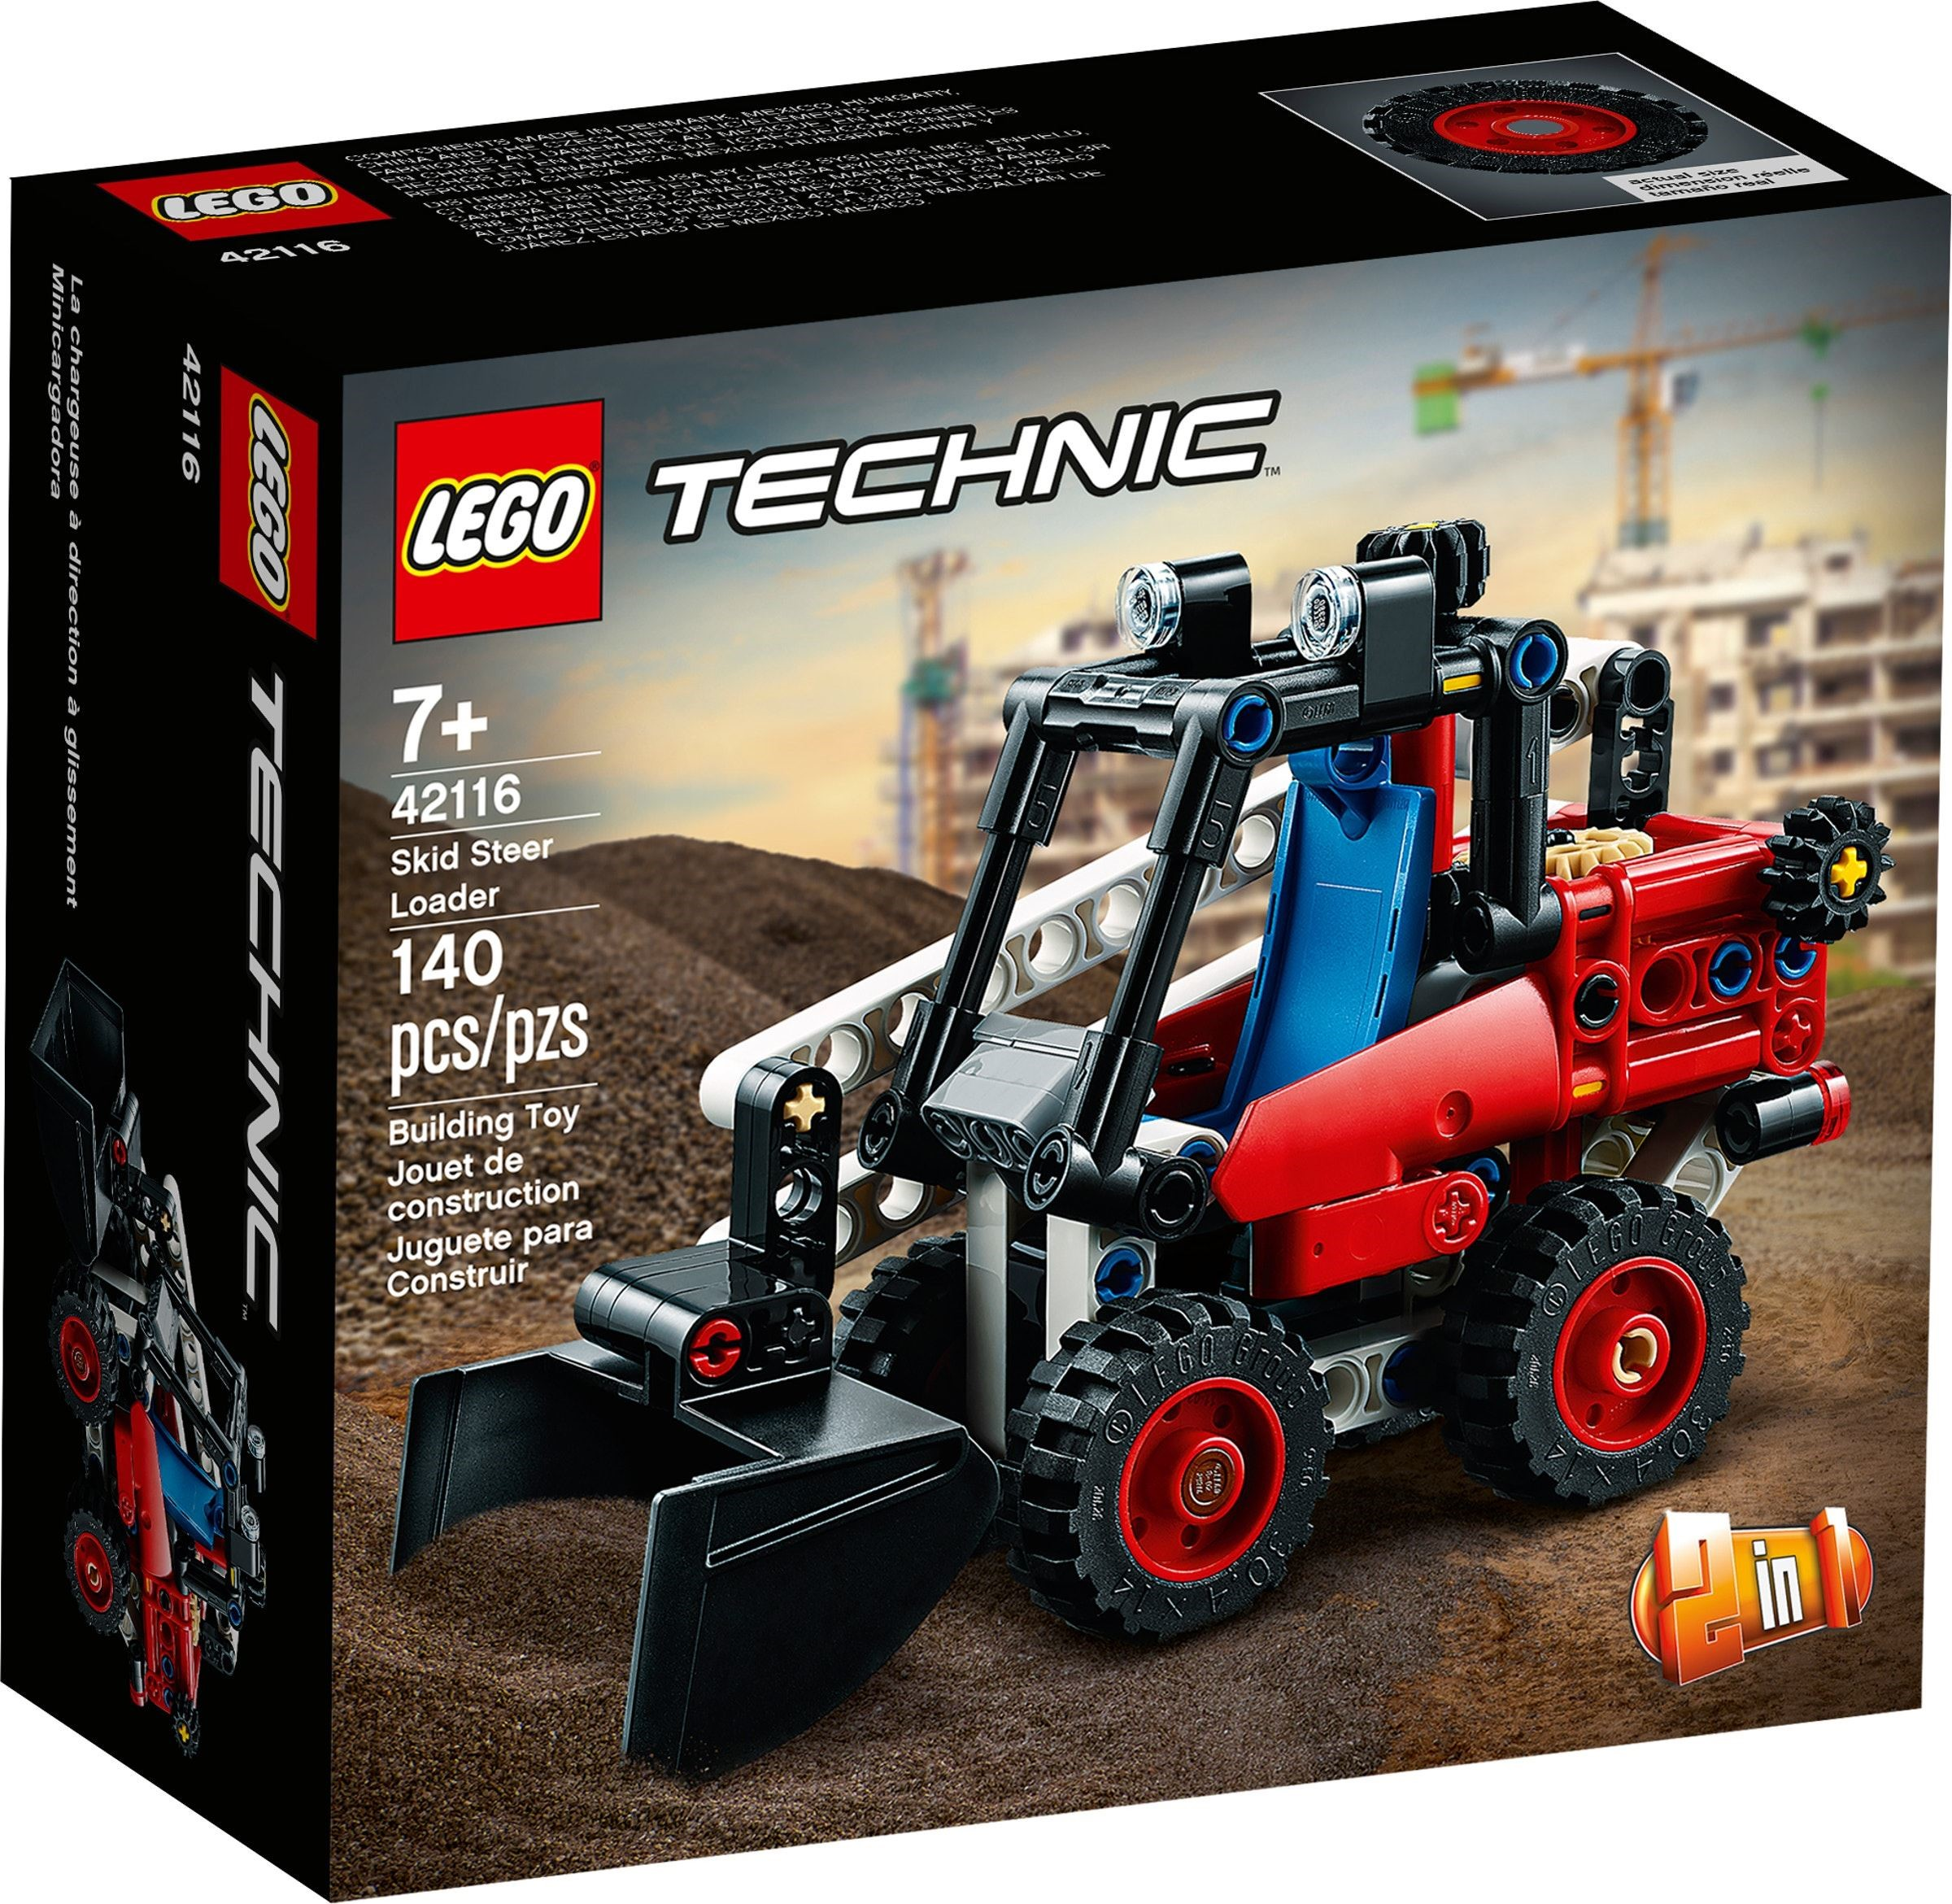 LEGO Technic - Skid Steer Loader (42116)